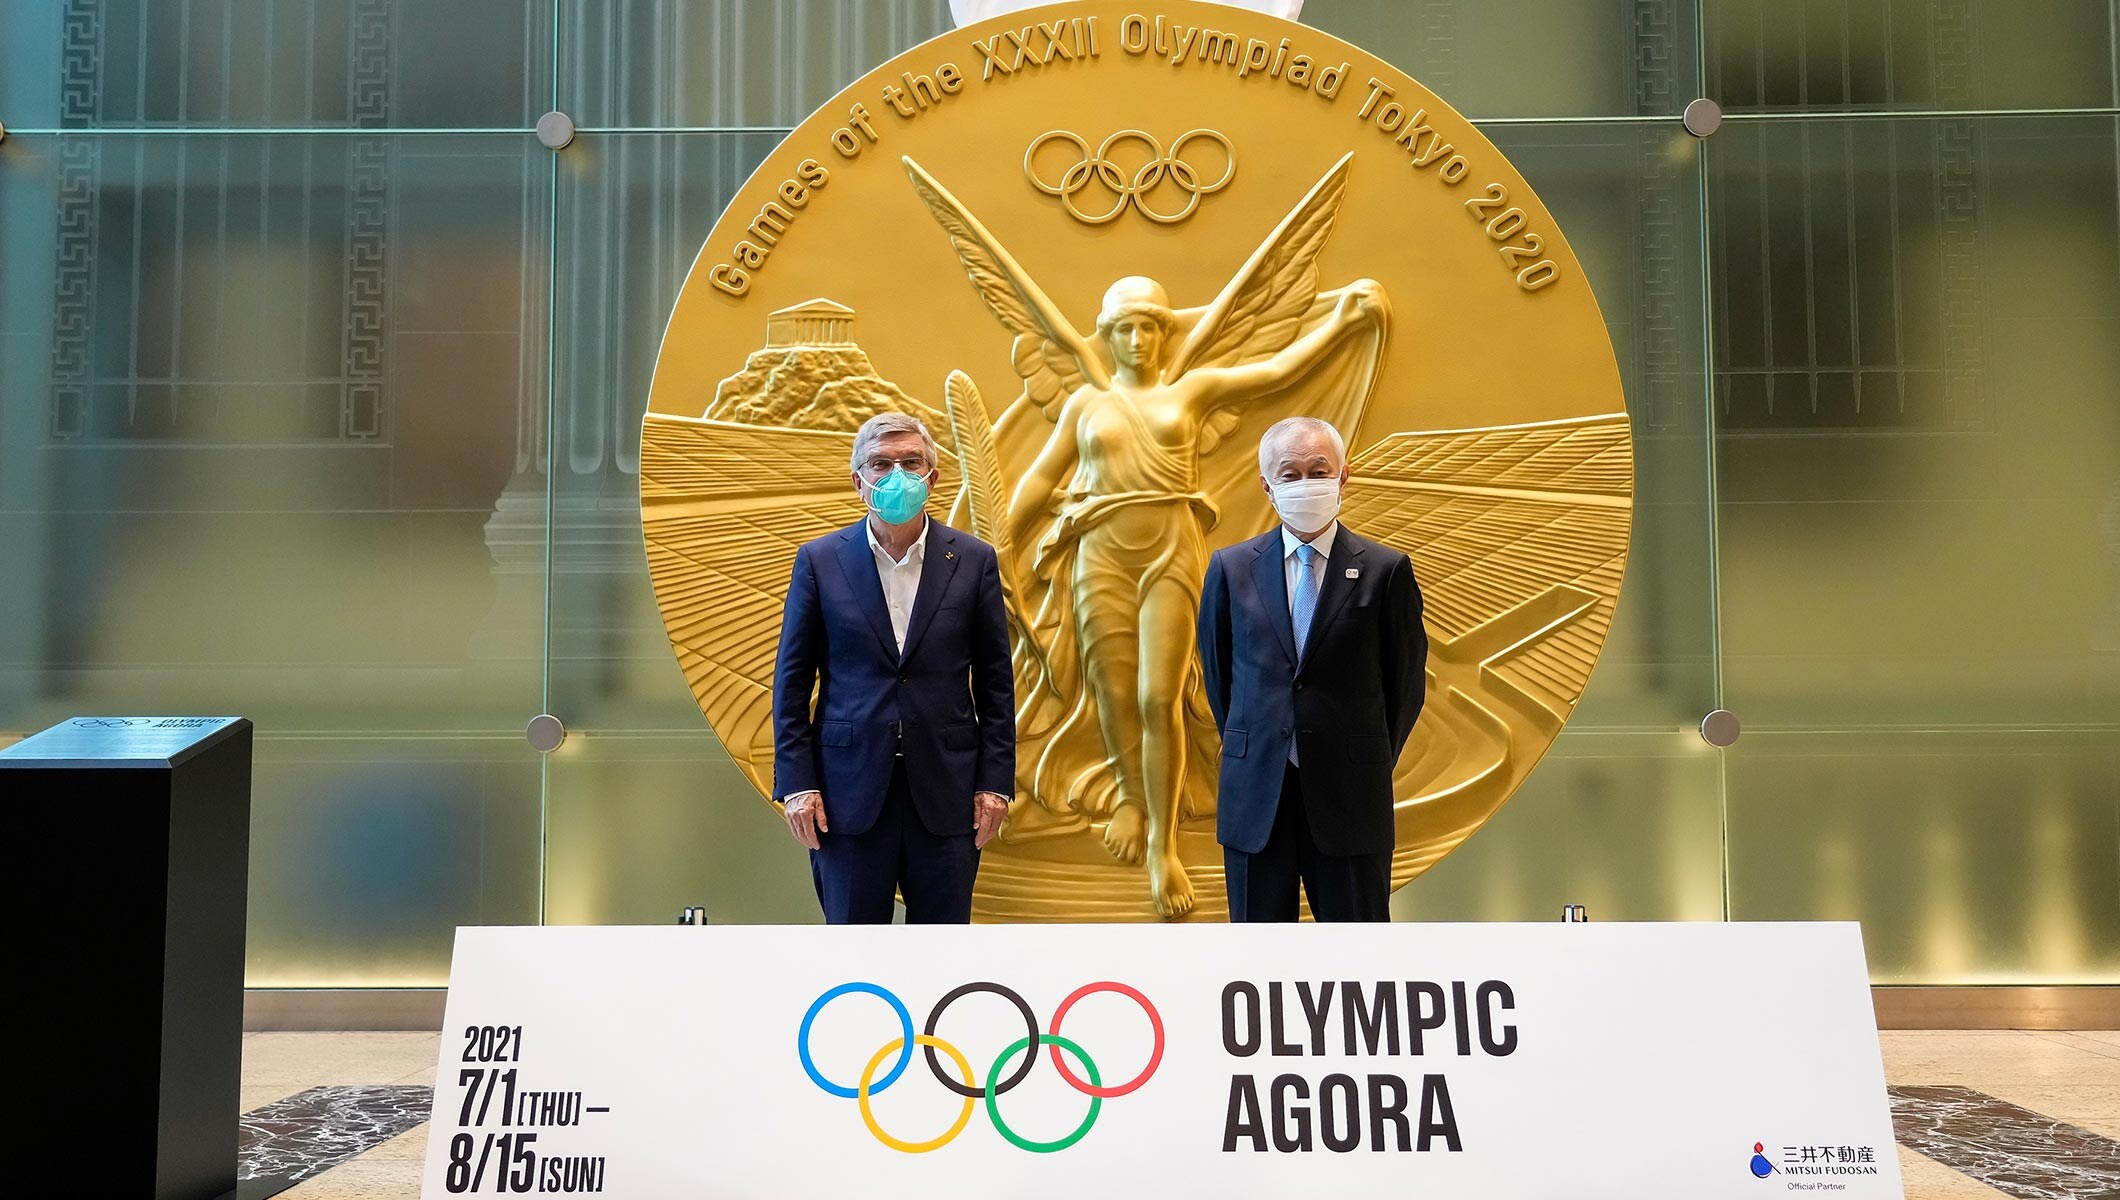 IOC President Thomas Bach vists the Olympic Agora